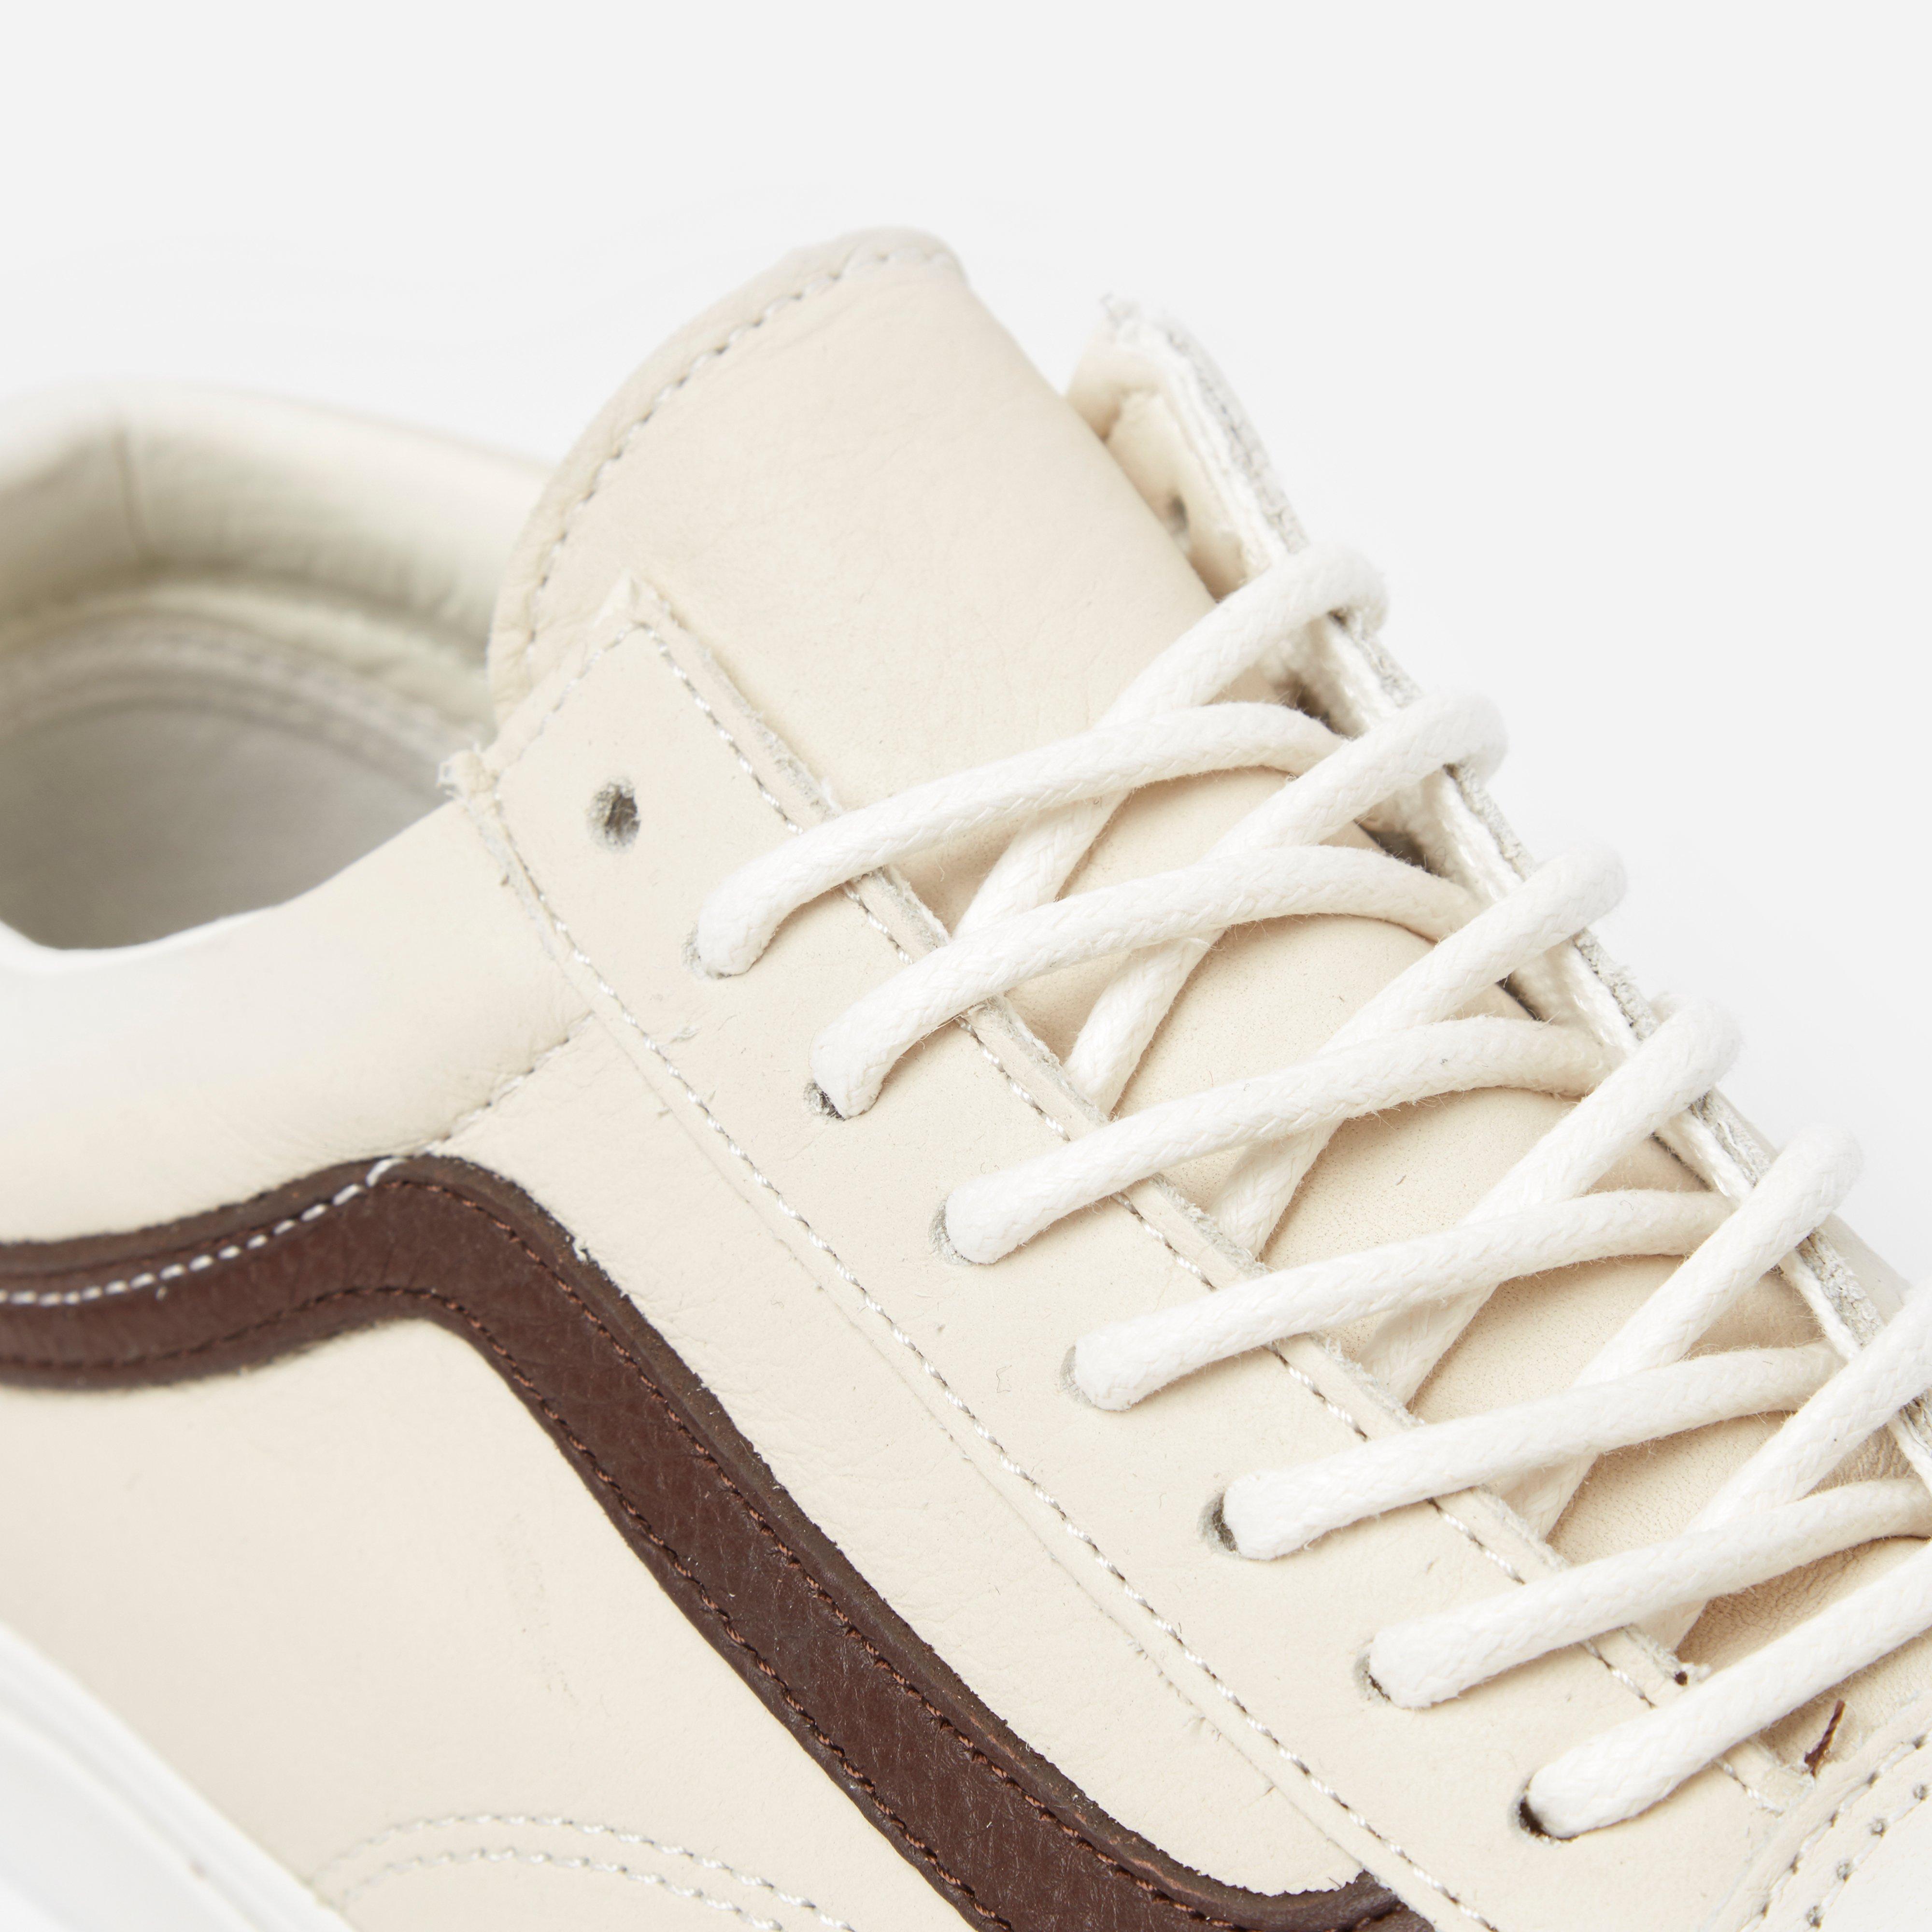 Vans Old Skool Leather in Cream (Natural) for Men